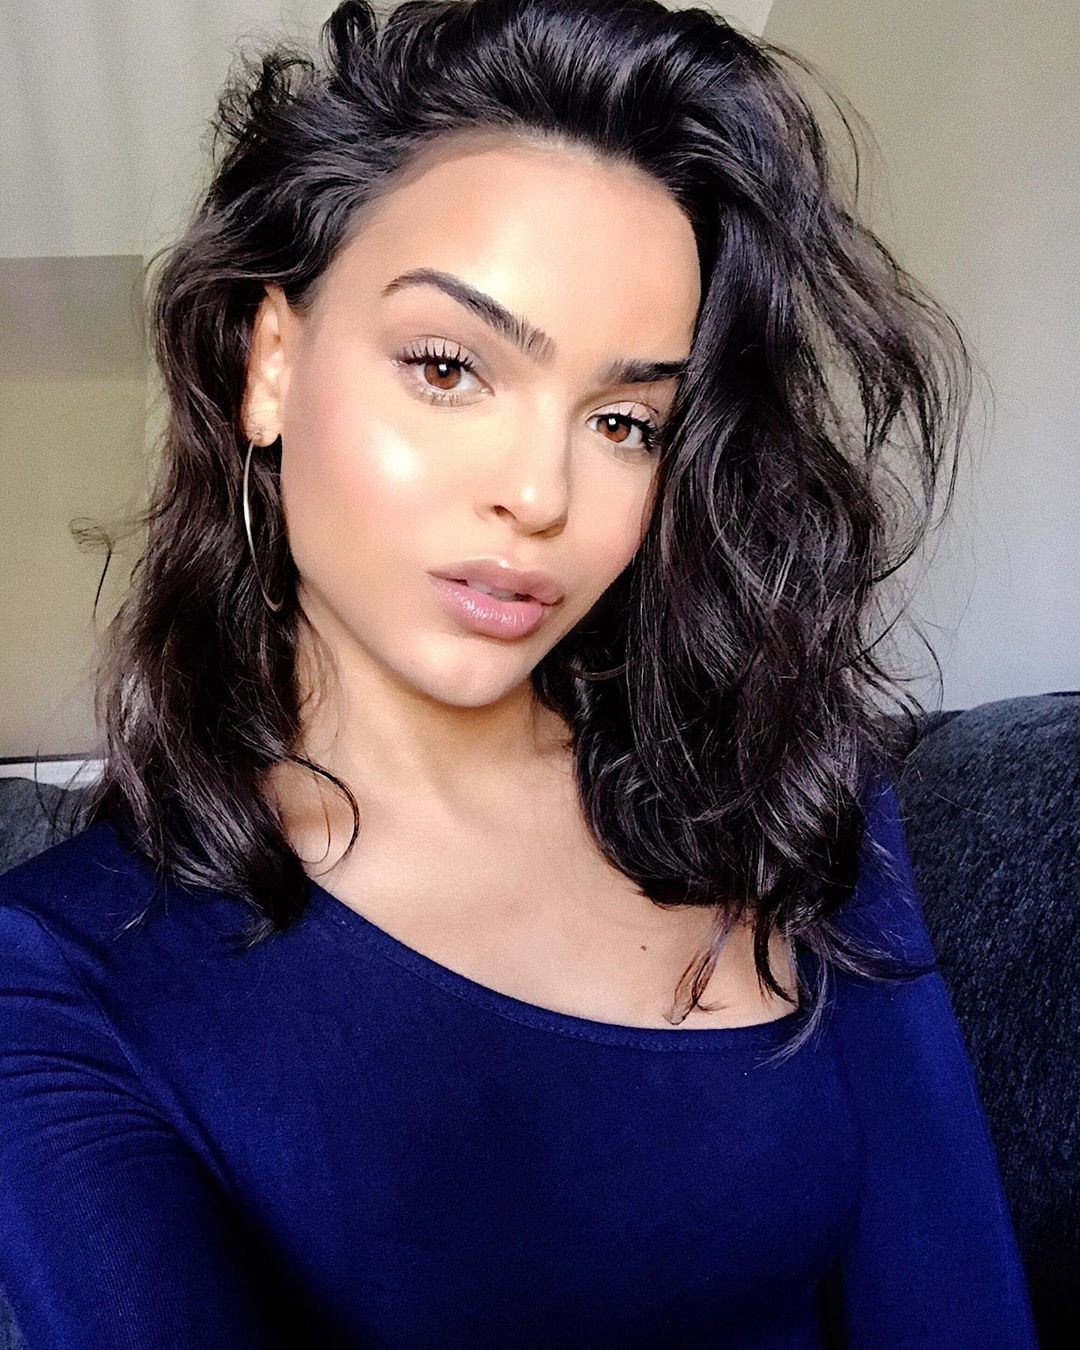 Lisa Ramos Dark Black Hairs, Face Makeup, Beautiful Lips